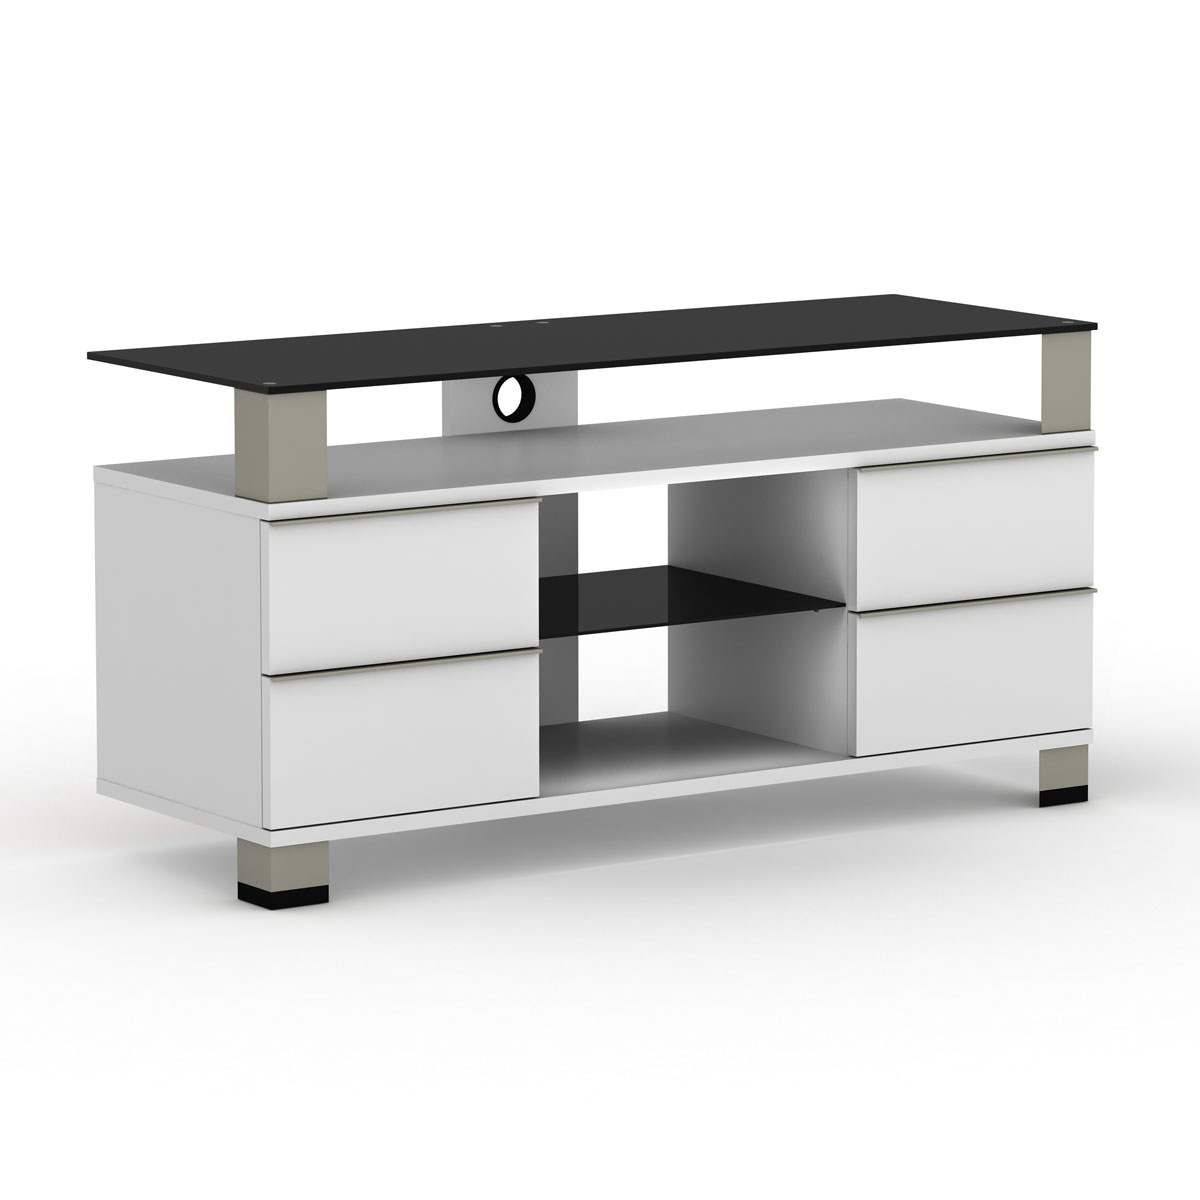 Elmob pone pn 120 02 blanc meuble tv elmob sur ldlc - Meuble television ecran plat ...